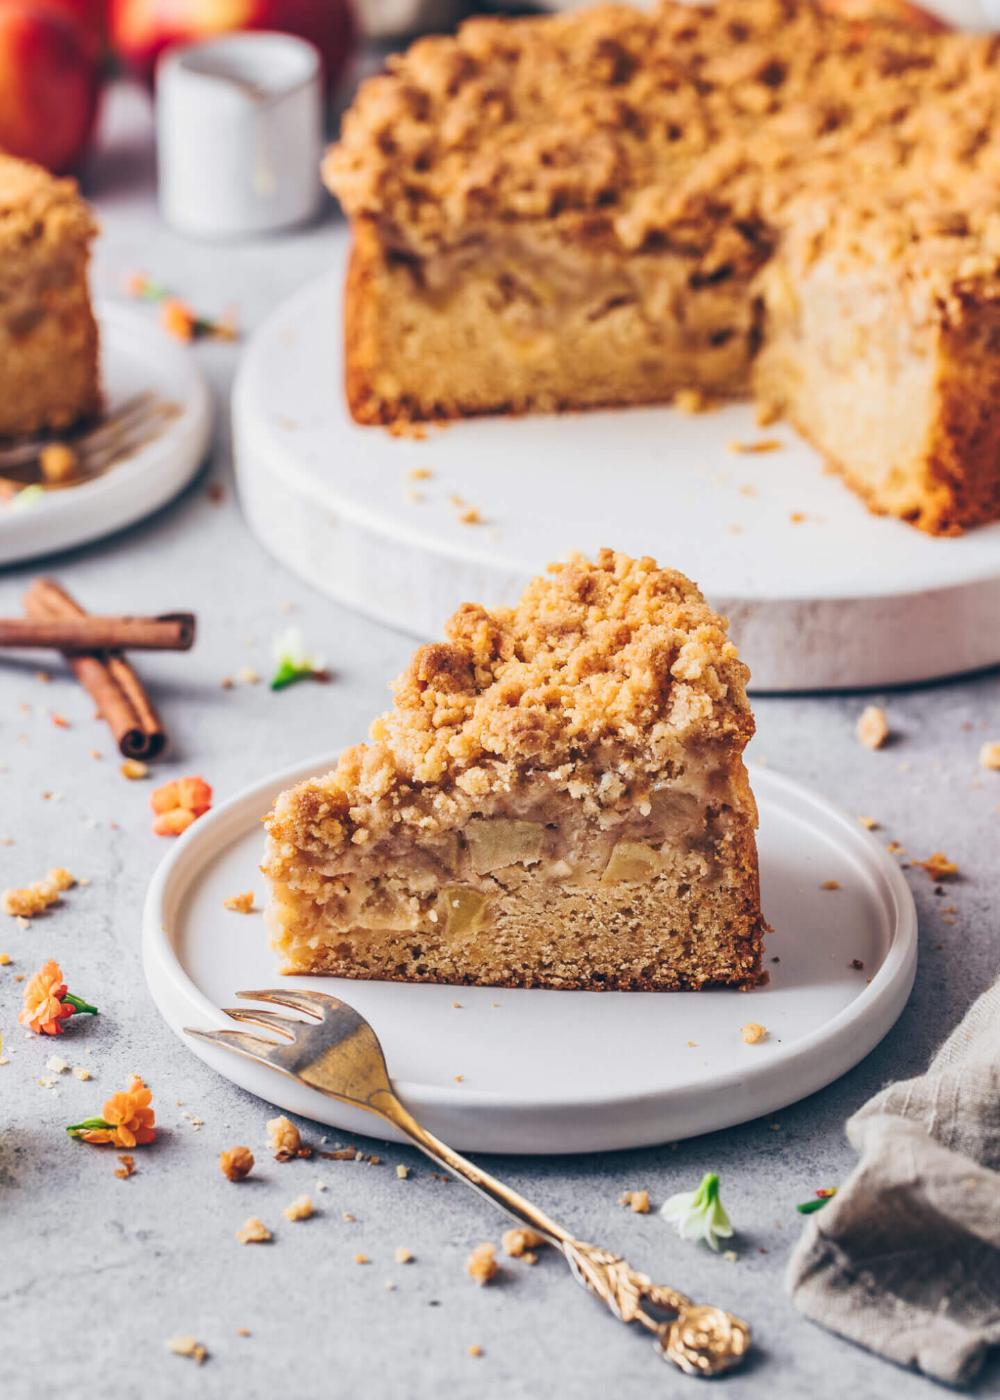 Vegan Apple Cake With Cinnamon Streusel Bianca Zapatka Recipes Recipe In 2020 Vegan Apple Cake Desserts Vegan Caramel